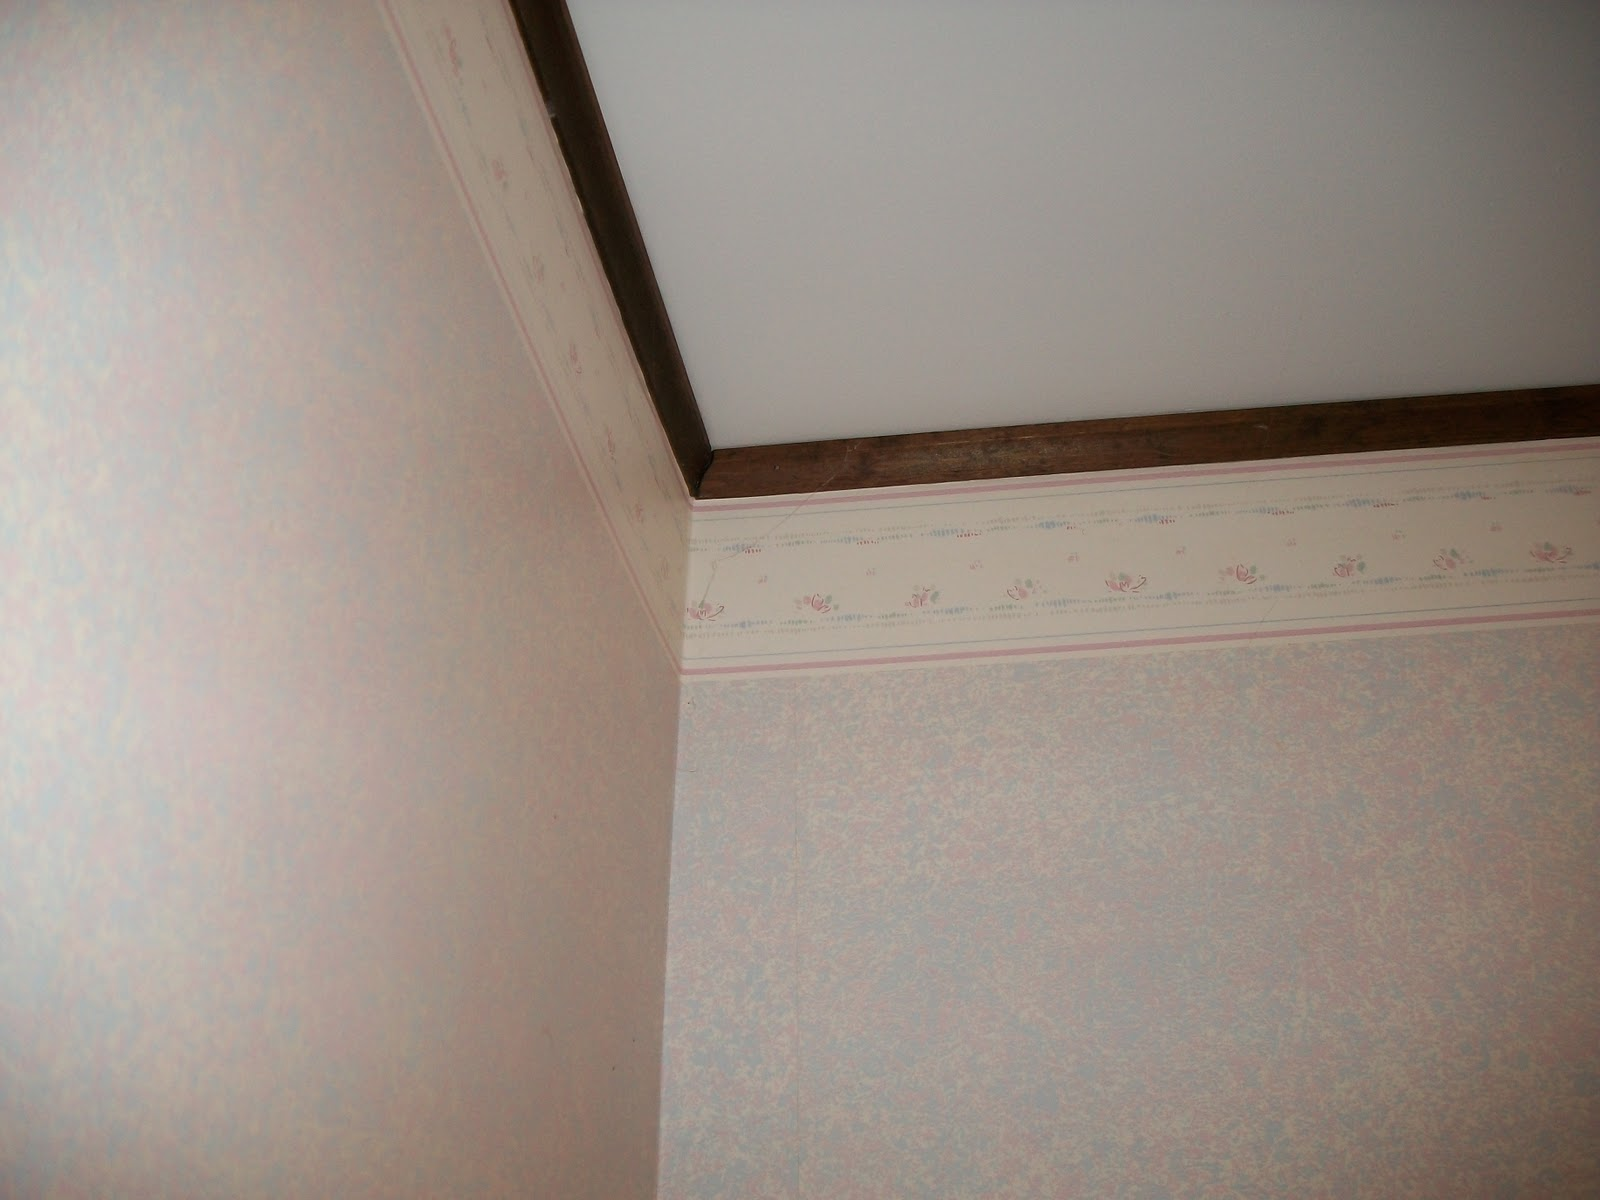 http://2.bp.blogspot.com/_hrNYhOxhjv8/TSsgHMaLkTI/AAAAAAAAG9c/wfXNxZ_NQfE/s1600/Laundry+room+wallpaper3.JPG